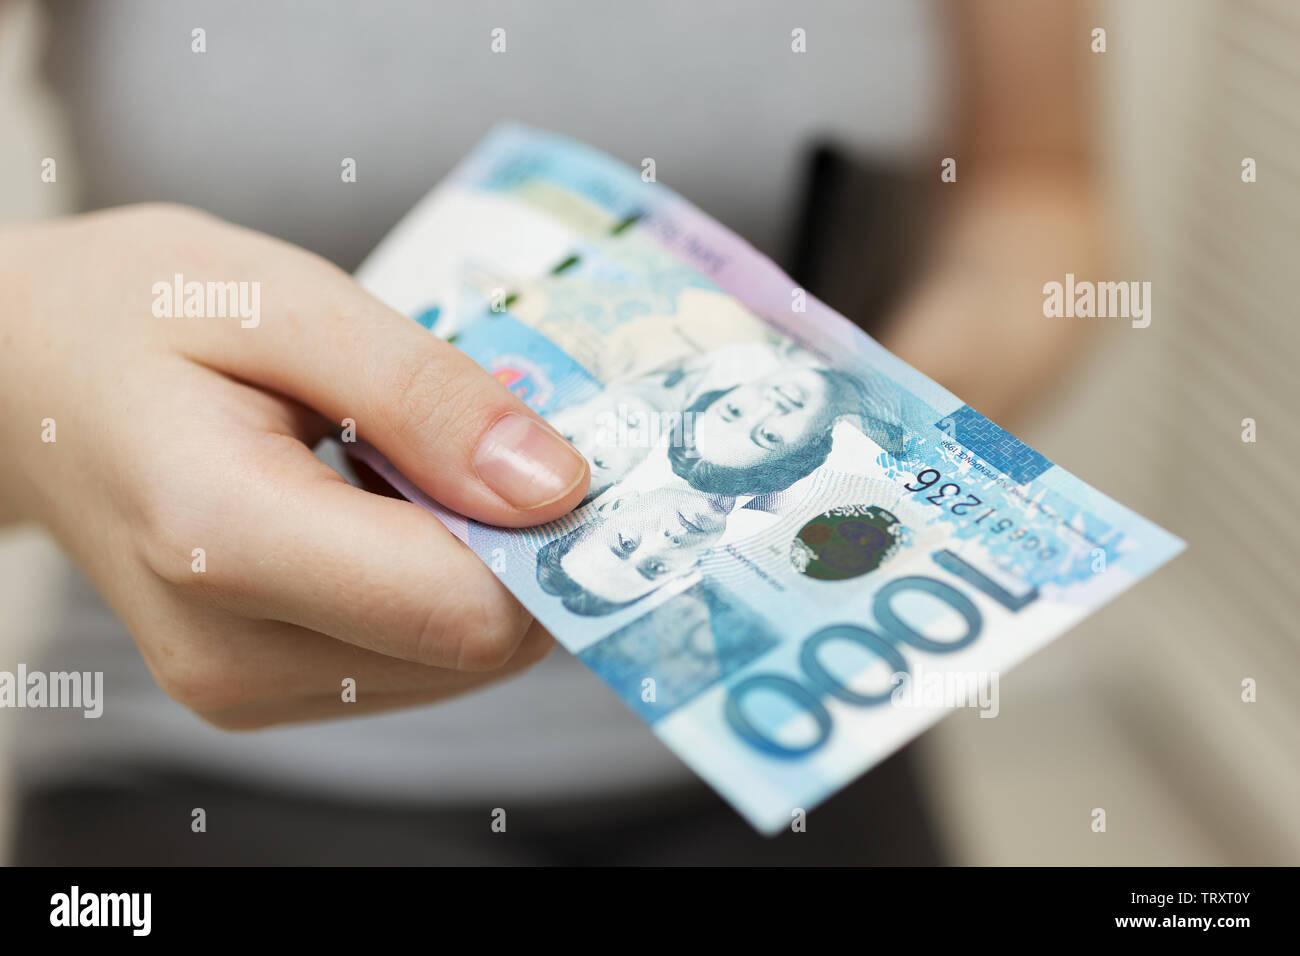 One Thousand Pesos Stock Photos & One Thousand Pesos Stock Images